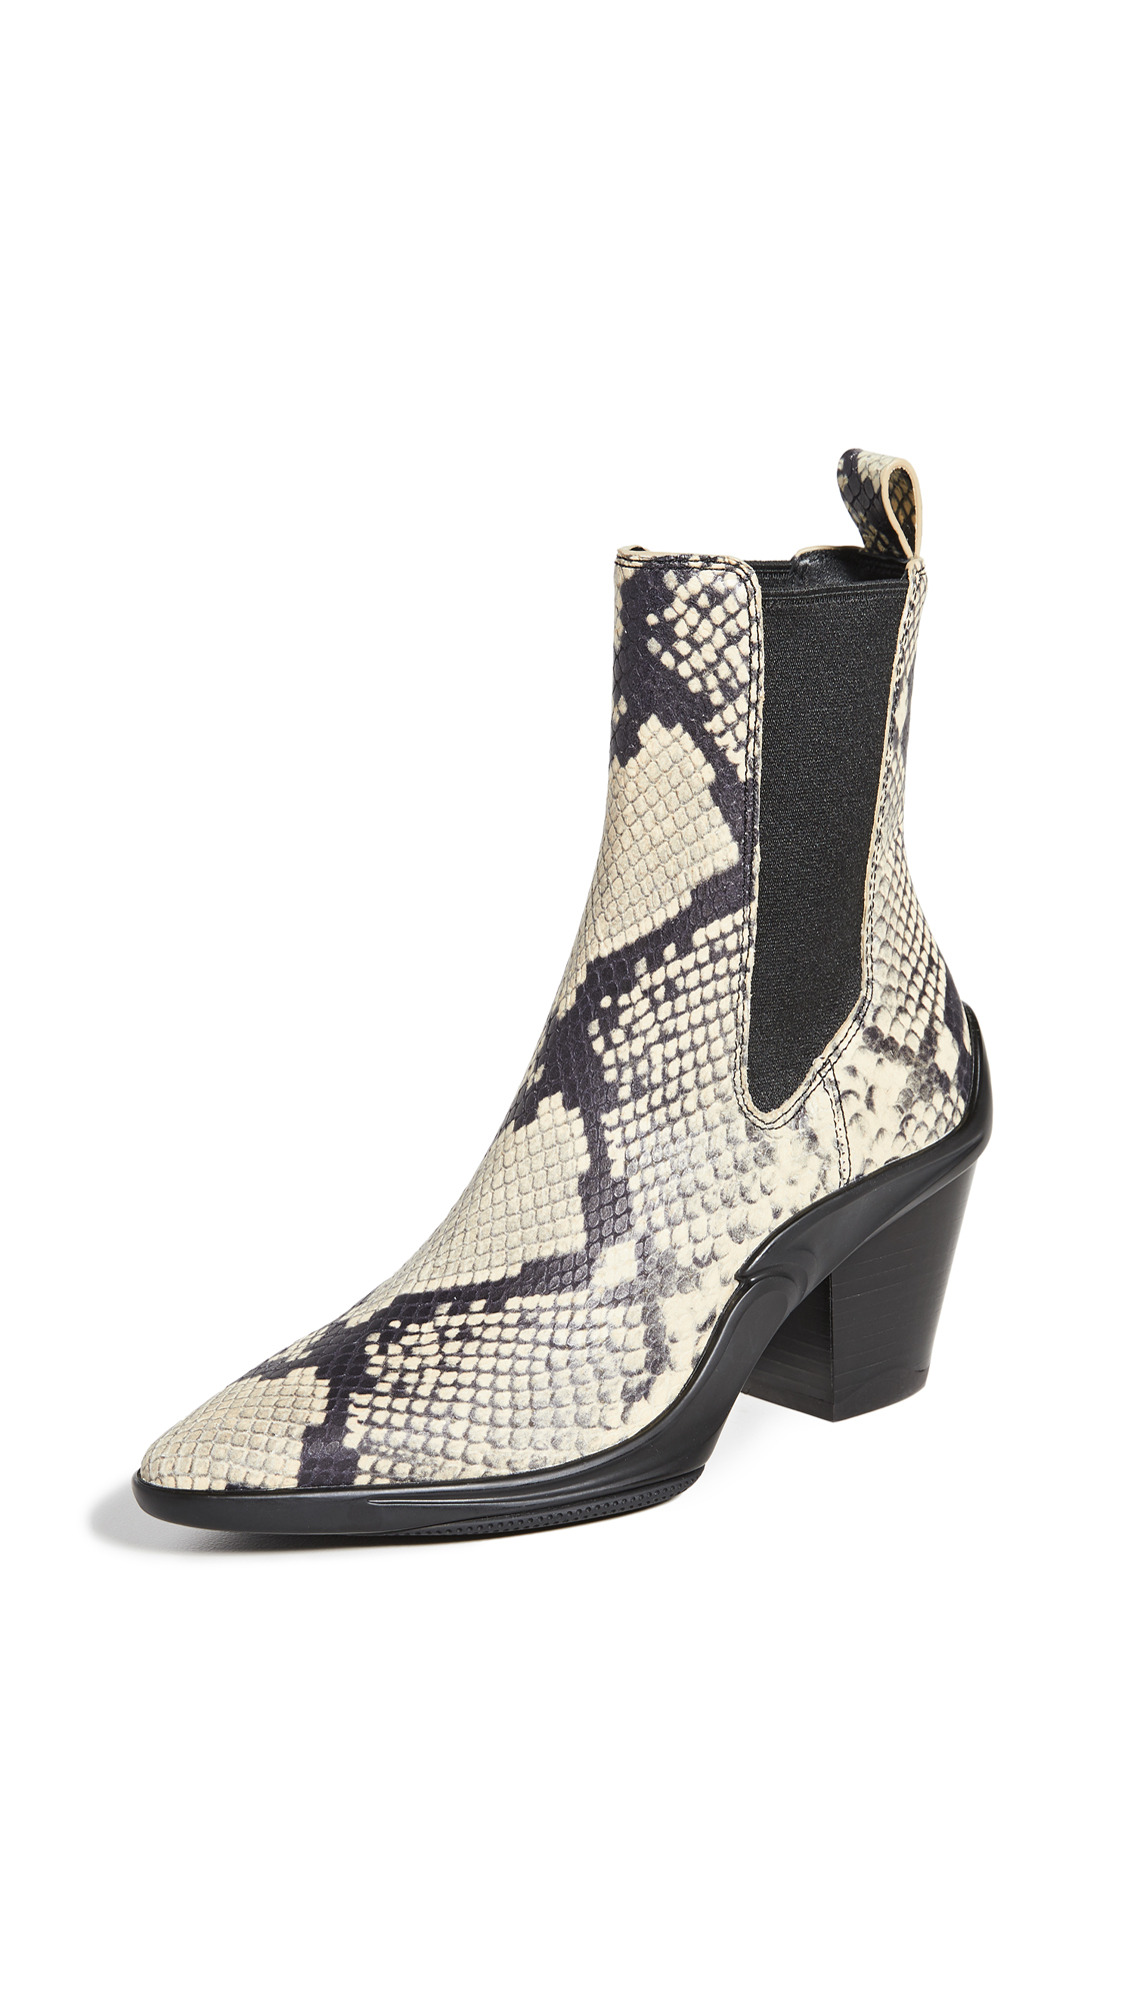 Stella Luna Hybrid Boots - 70% Off Sale